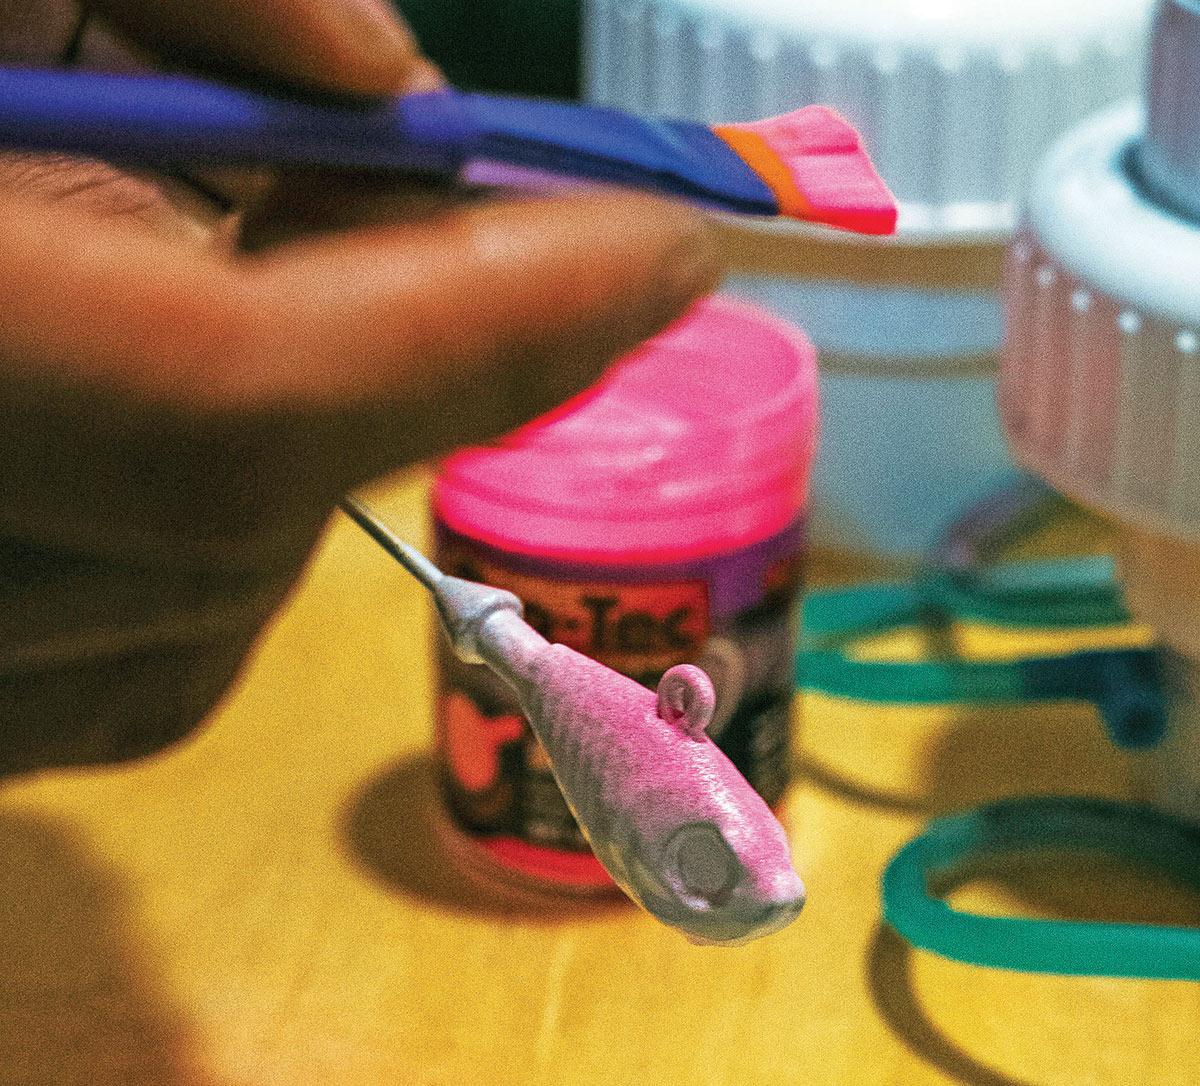 2019 3 Powder Paint Your Own Jigs Paint 6